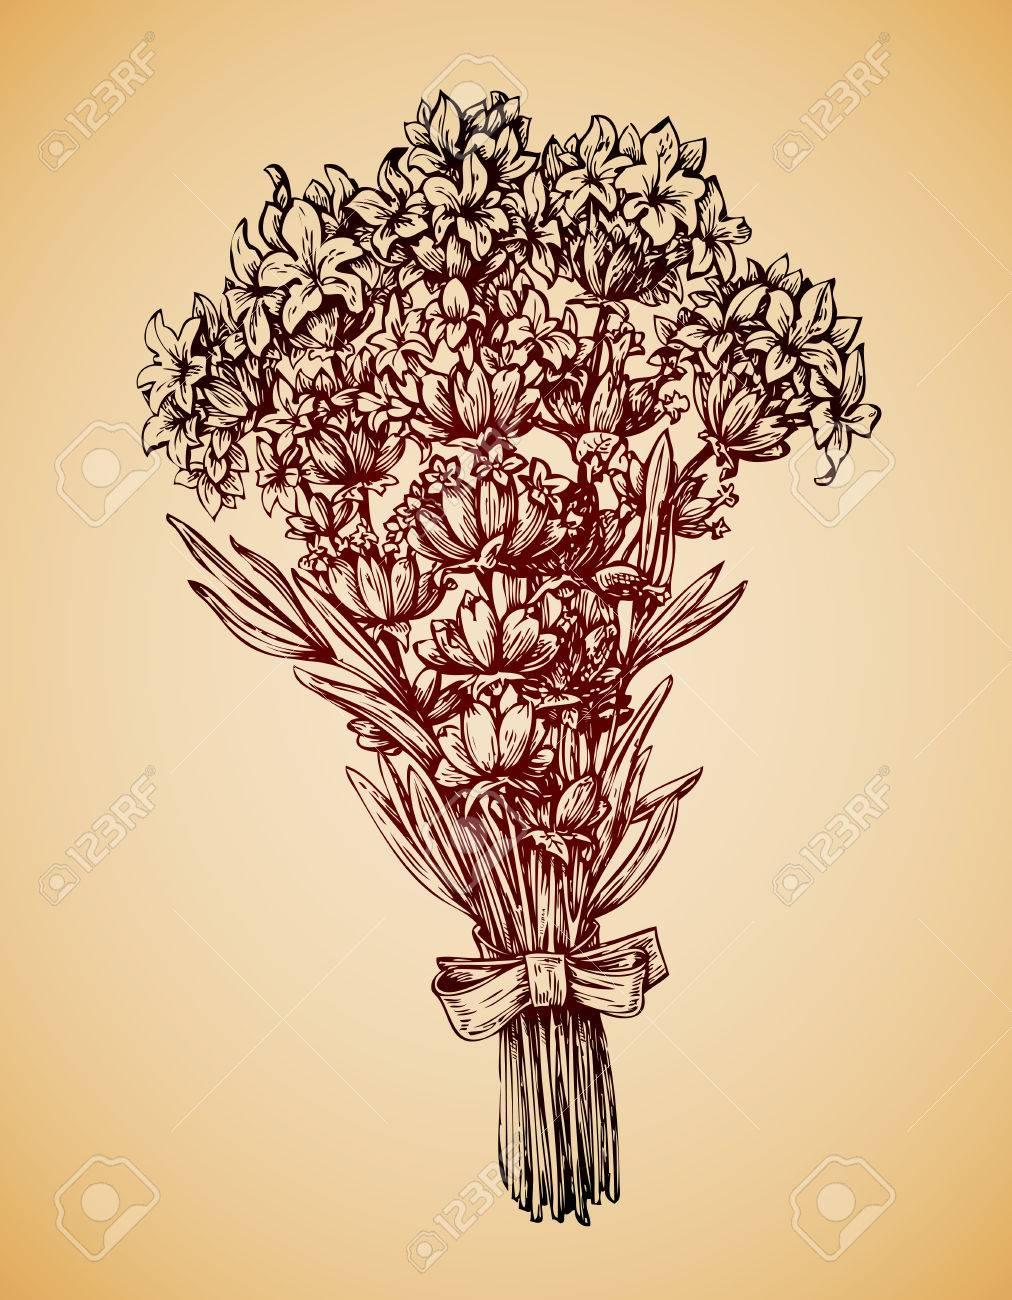 1012x1300 Vintage Bouquet Of Flowers. Hand Drawn Retro Sketch Lavender